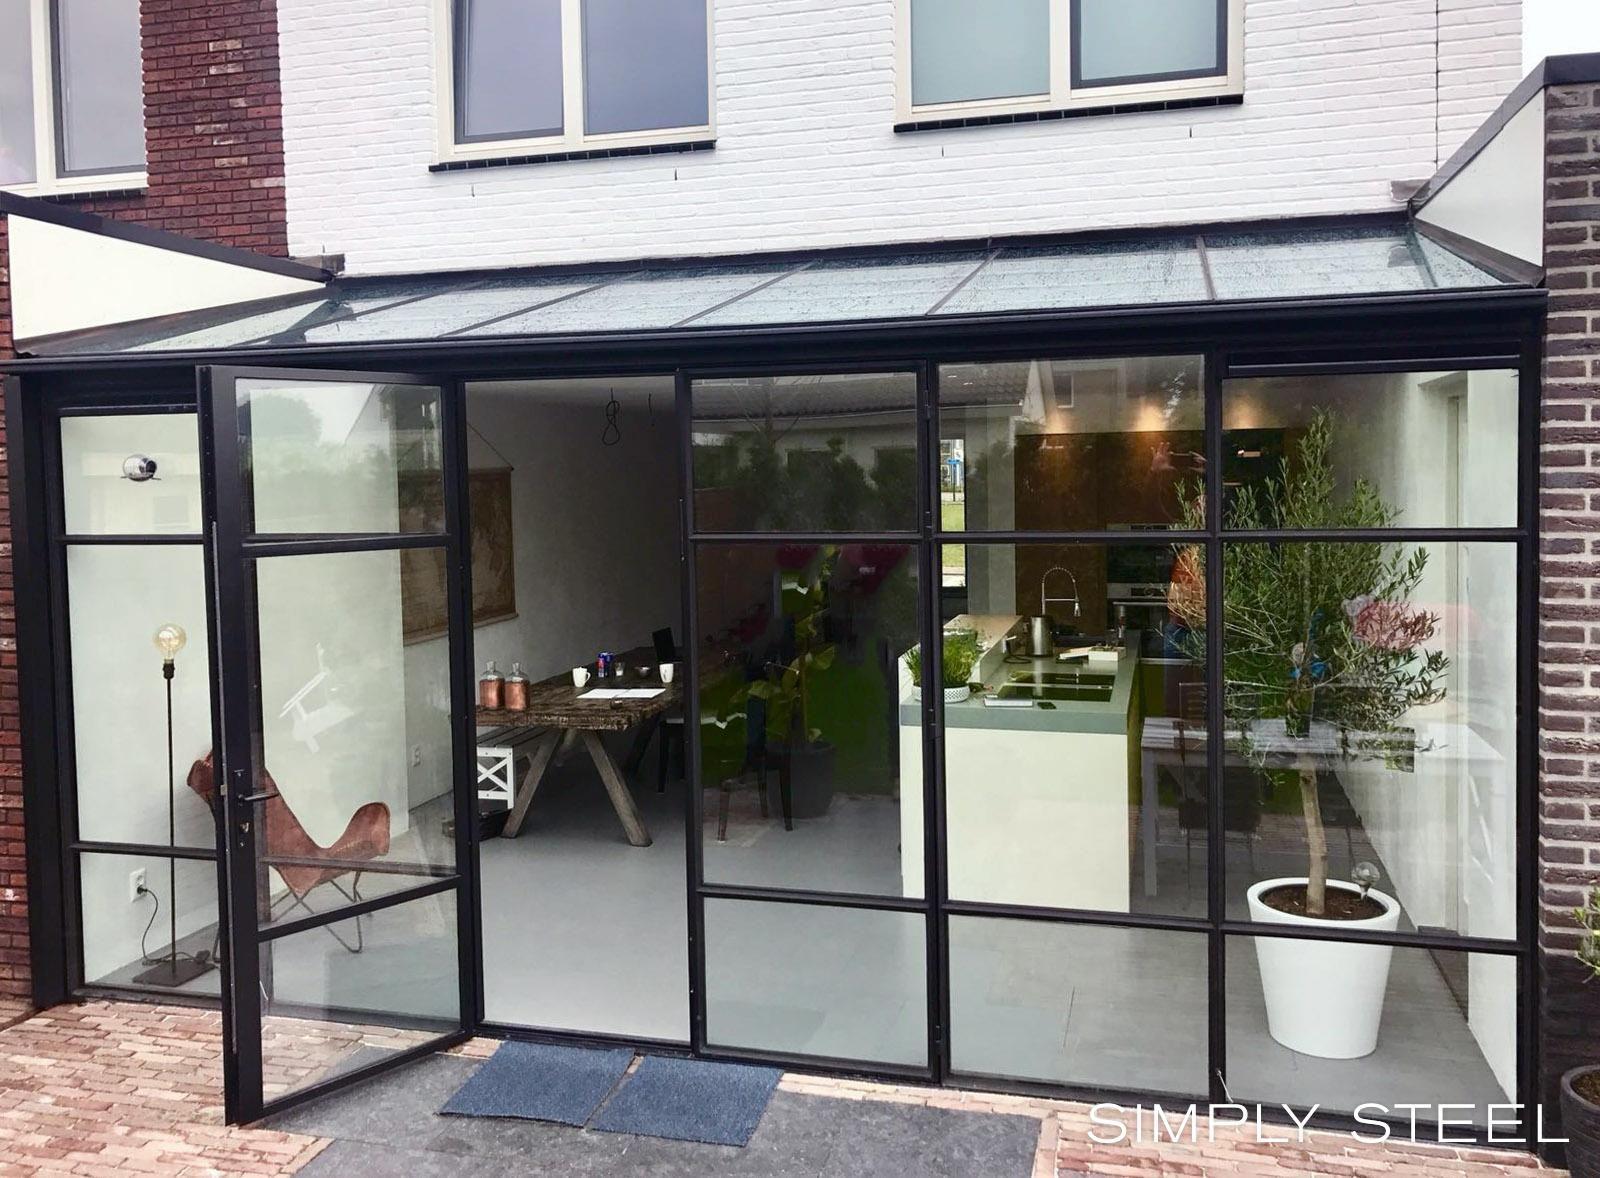 Veranda Metal Et Verre simply steel   rustiek huis ontwerp, huis verbouwen, serre